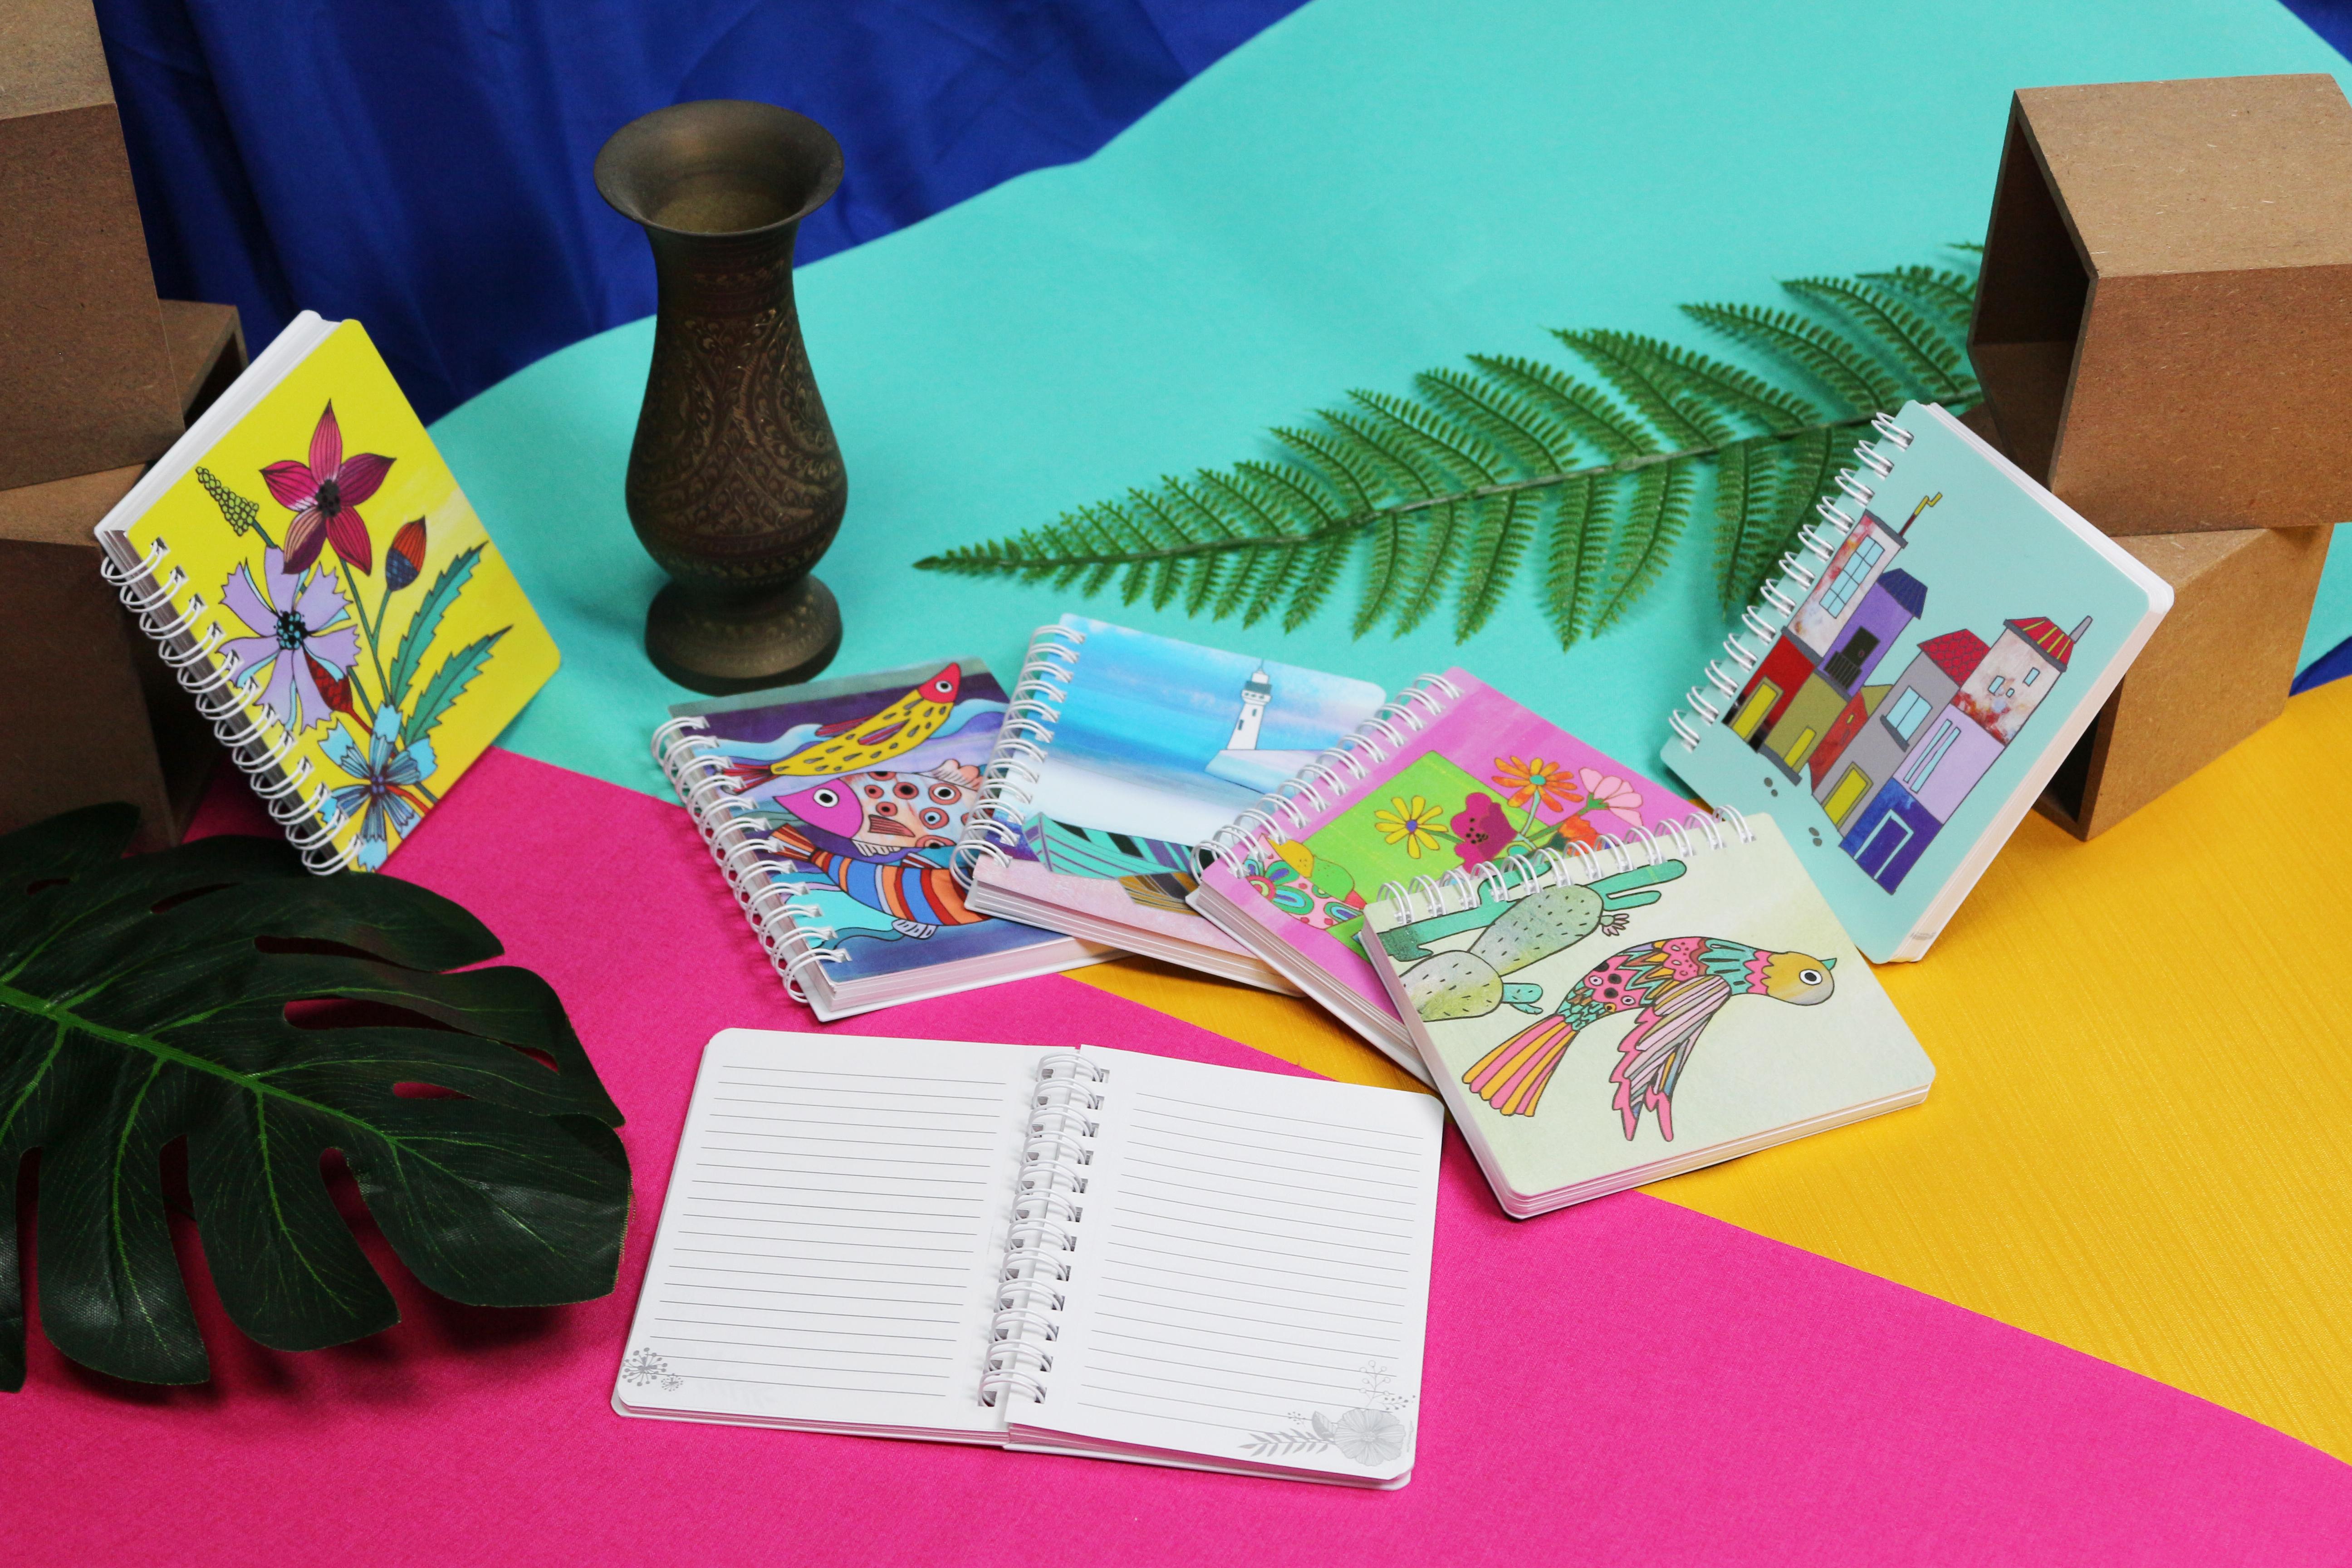 Cha Cha design journal notebook